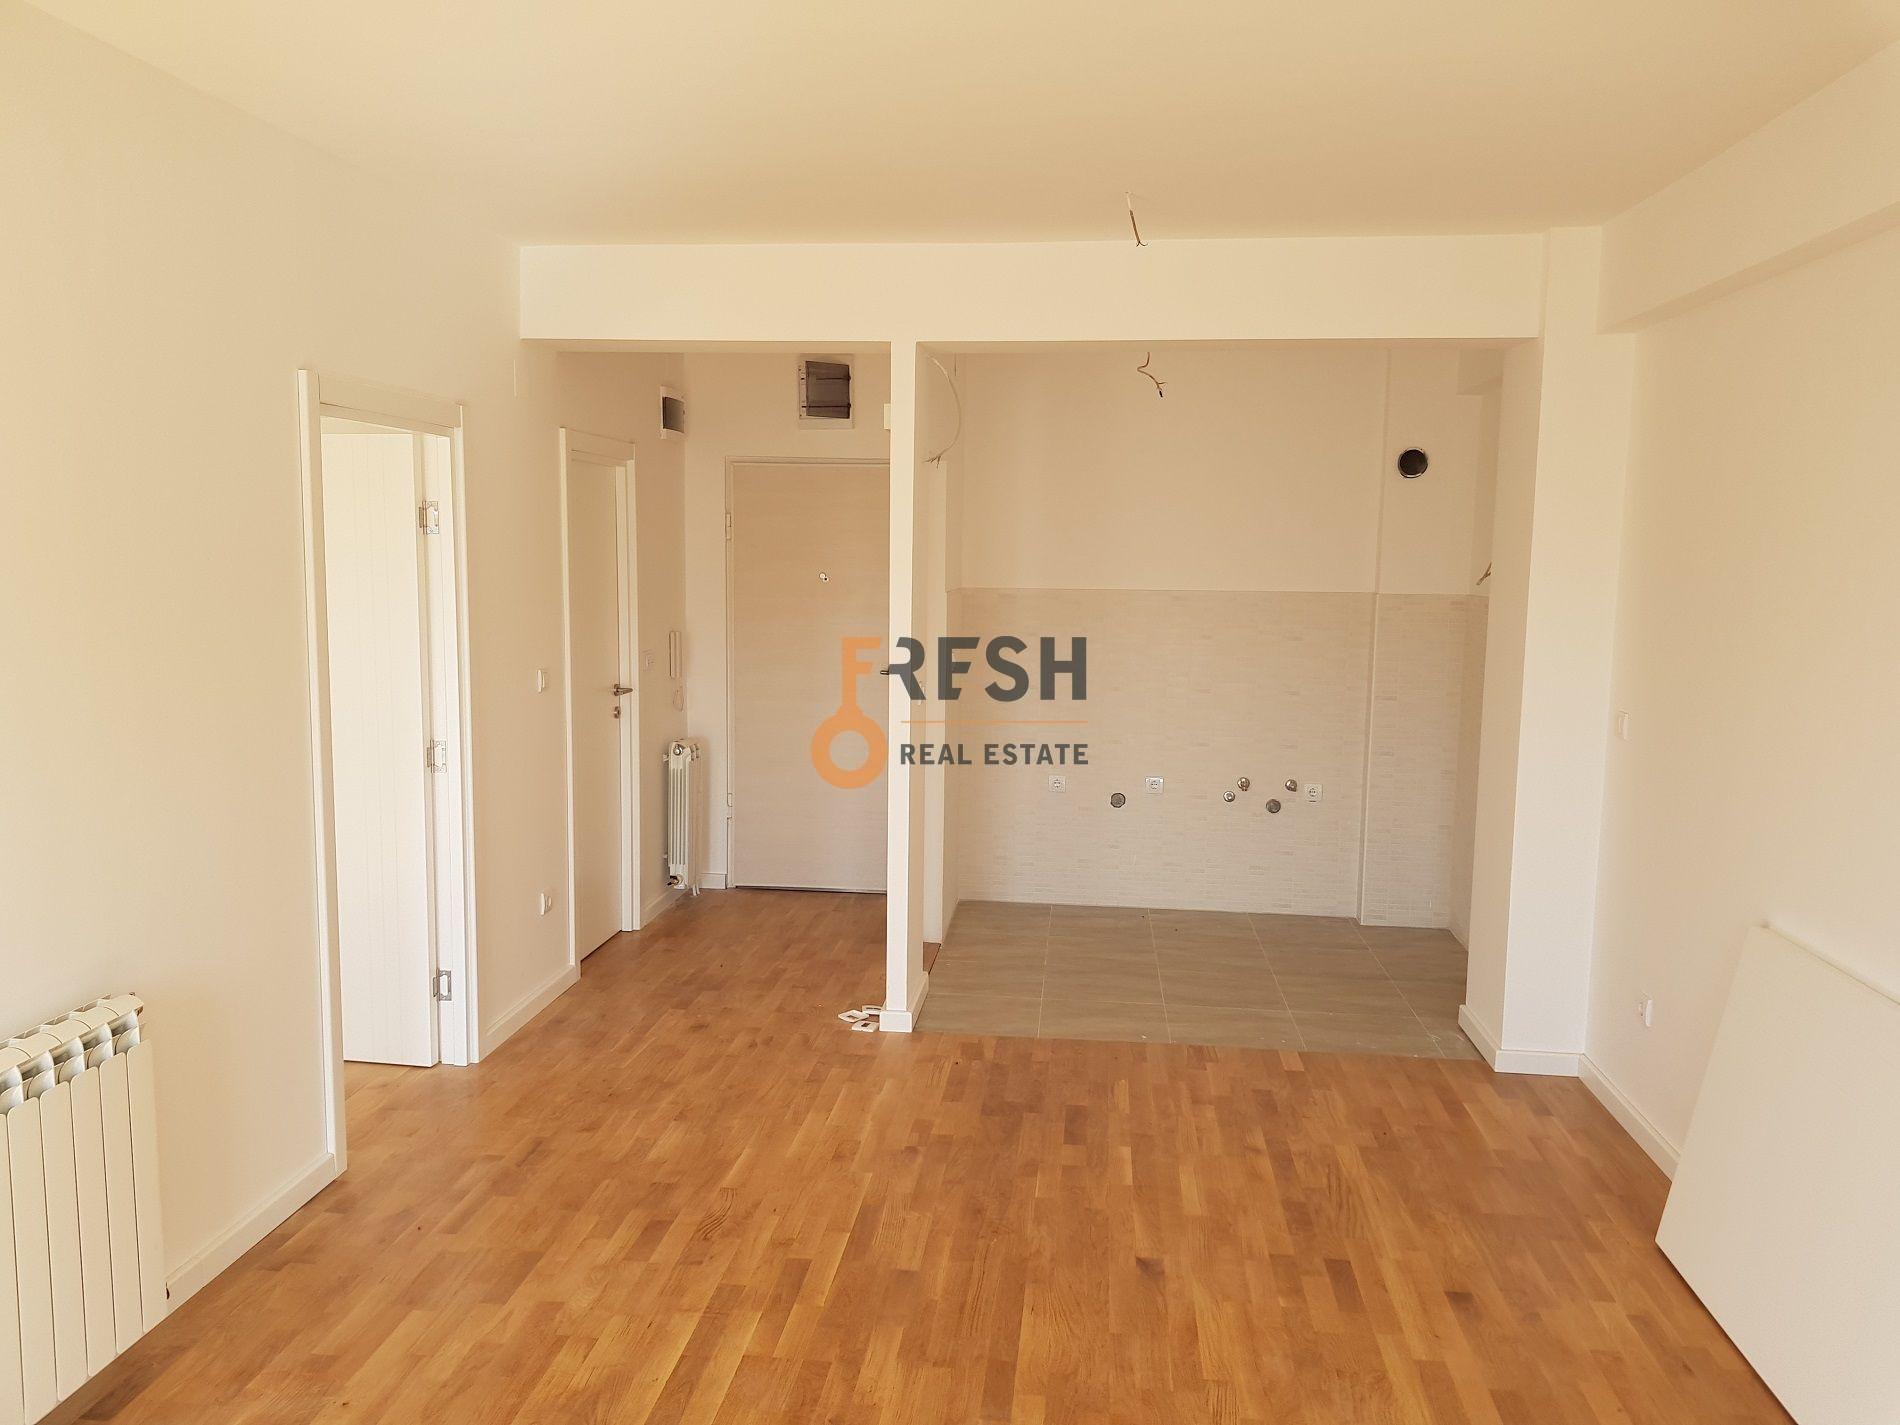 Jednosoban stan 45 m2, Centar, Pljevlja, Prodaja - 7